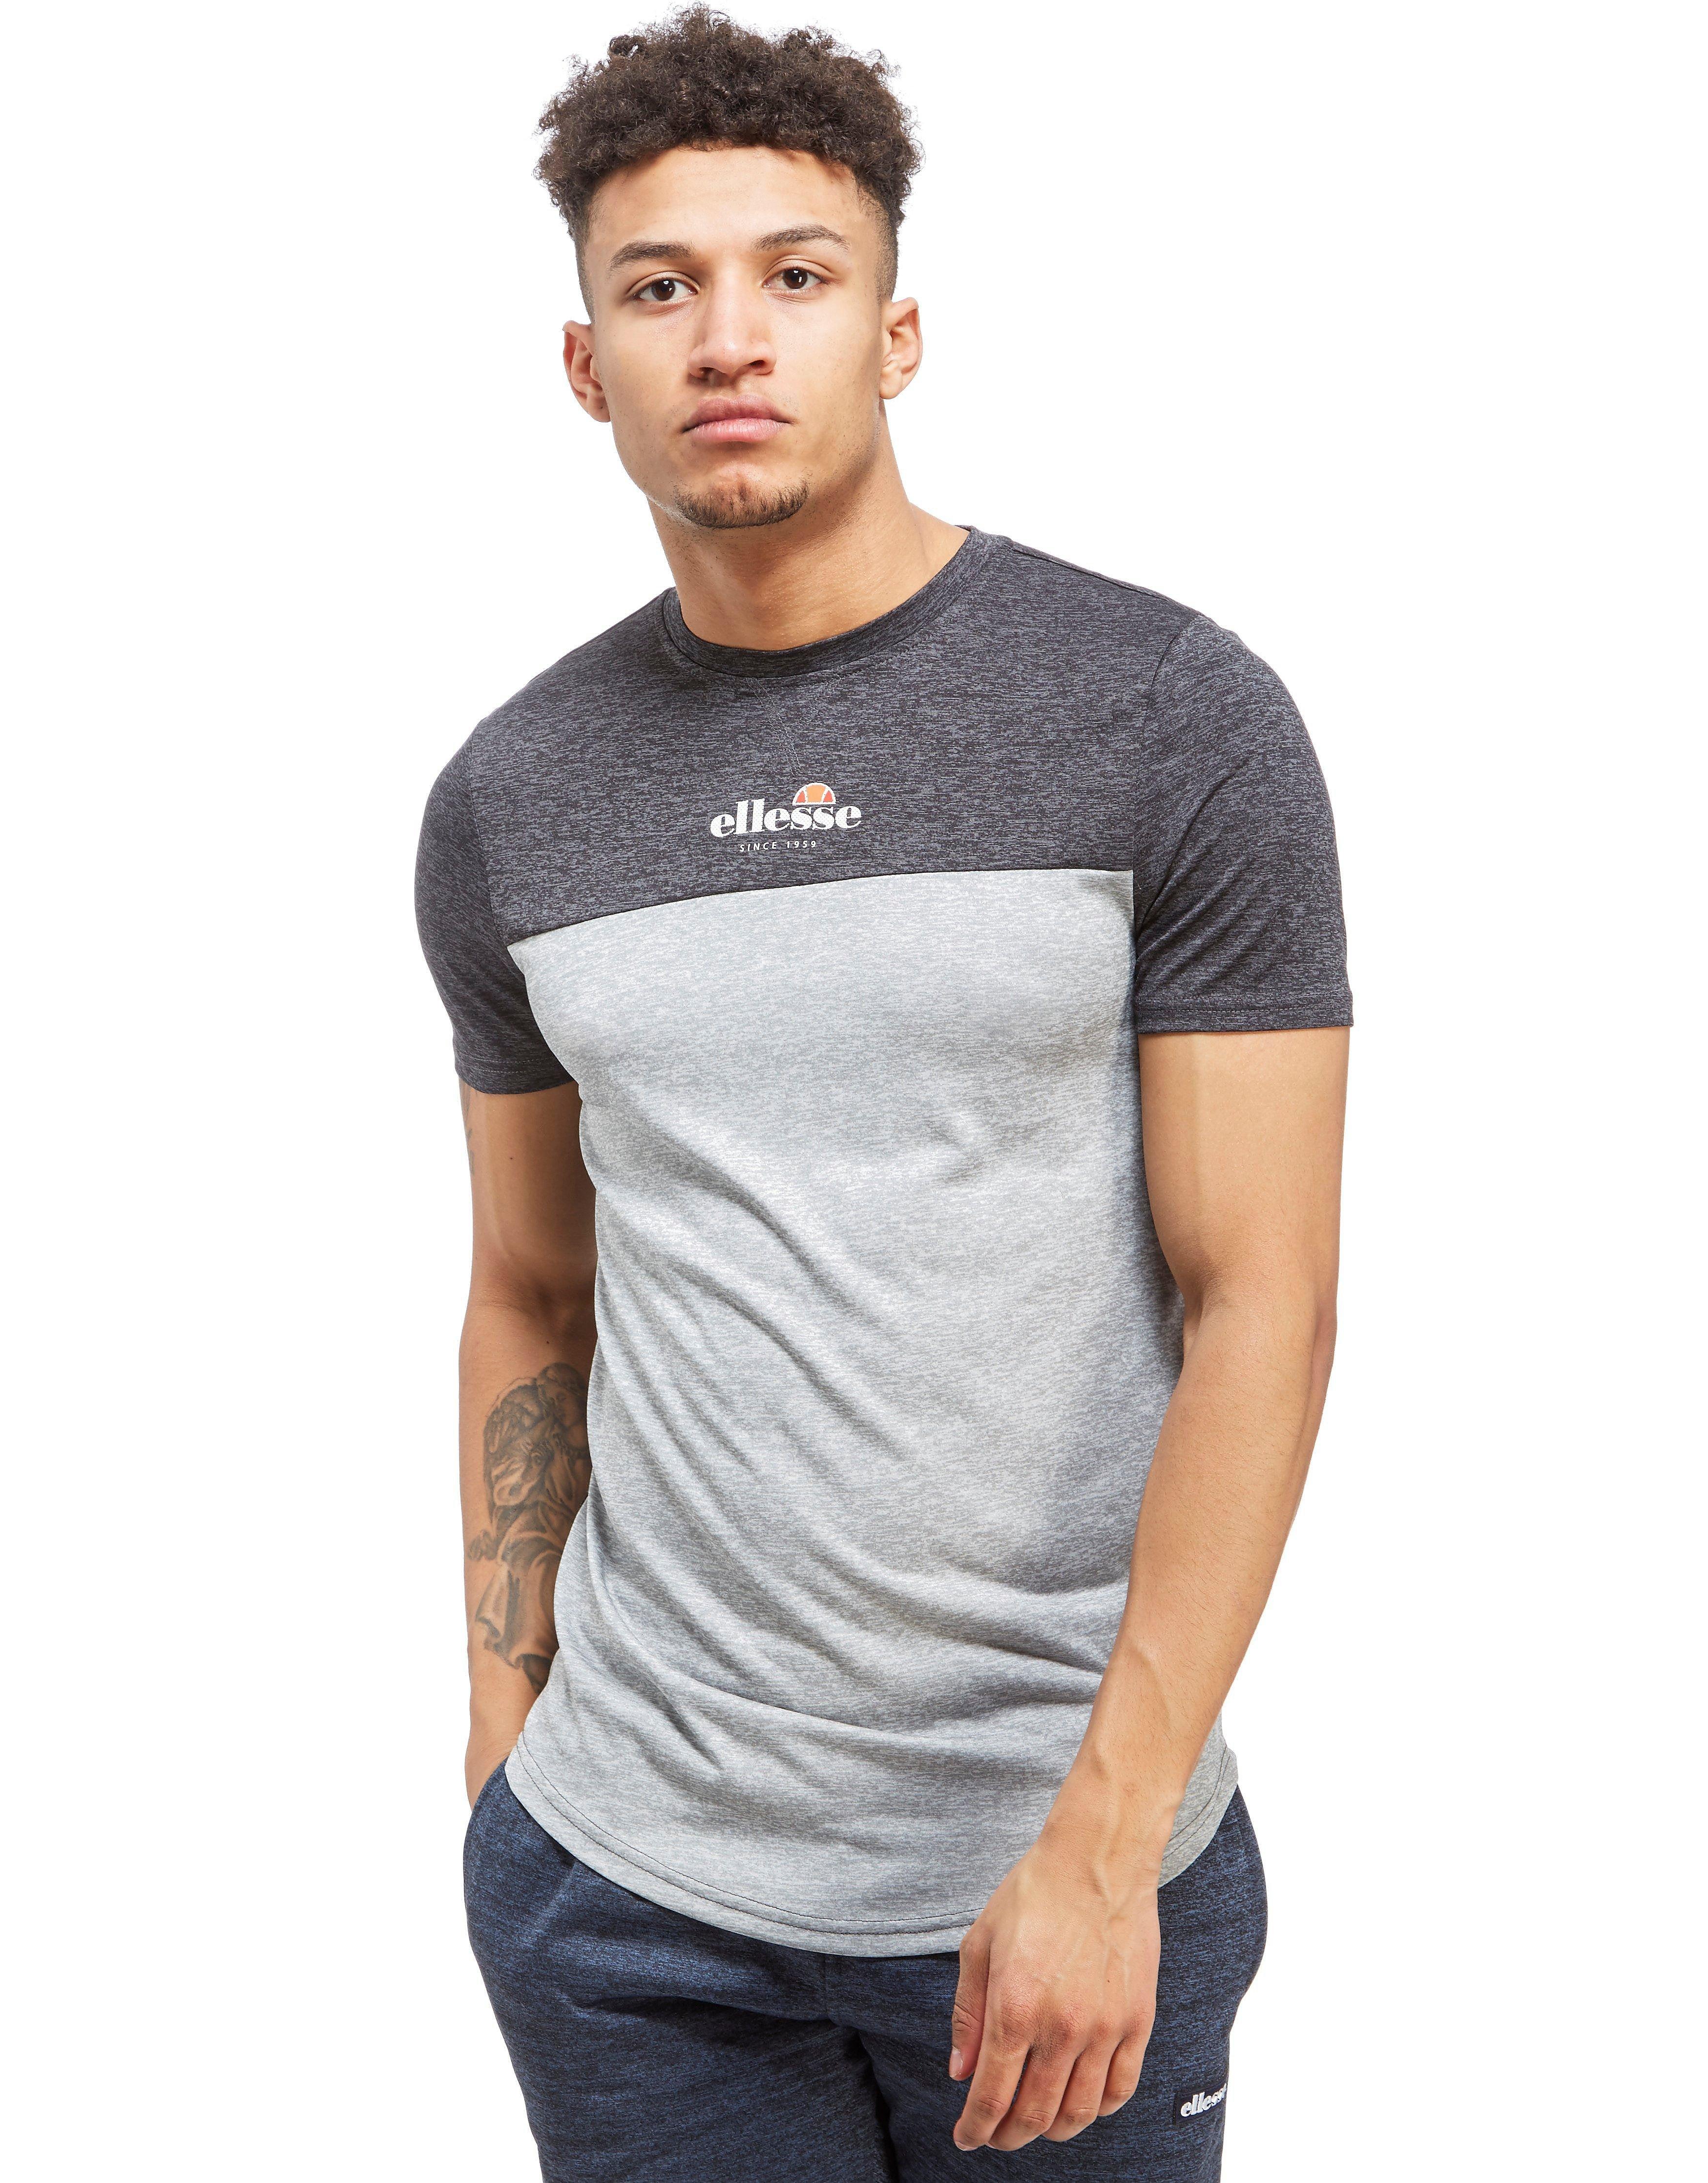 Ellesse Marevelino T-Shirt